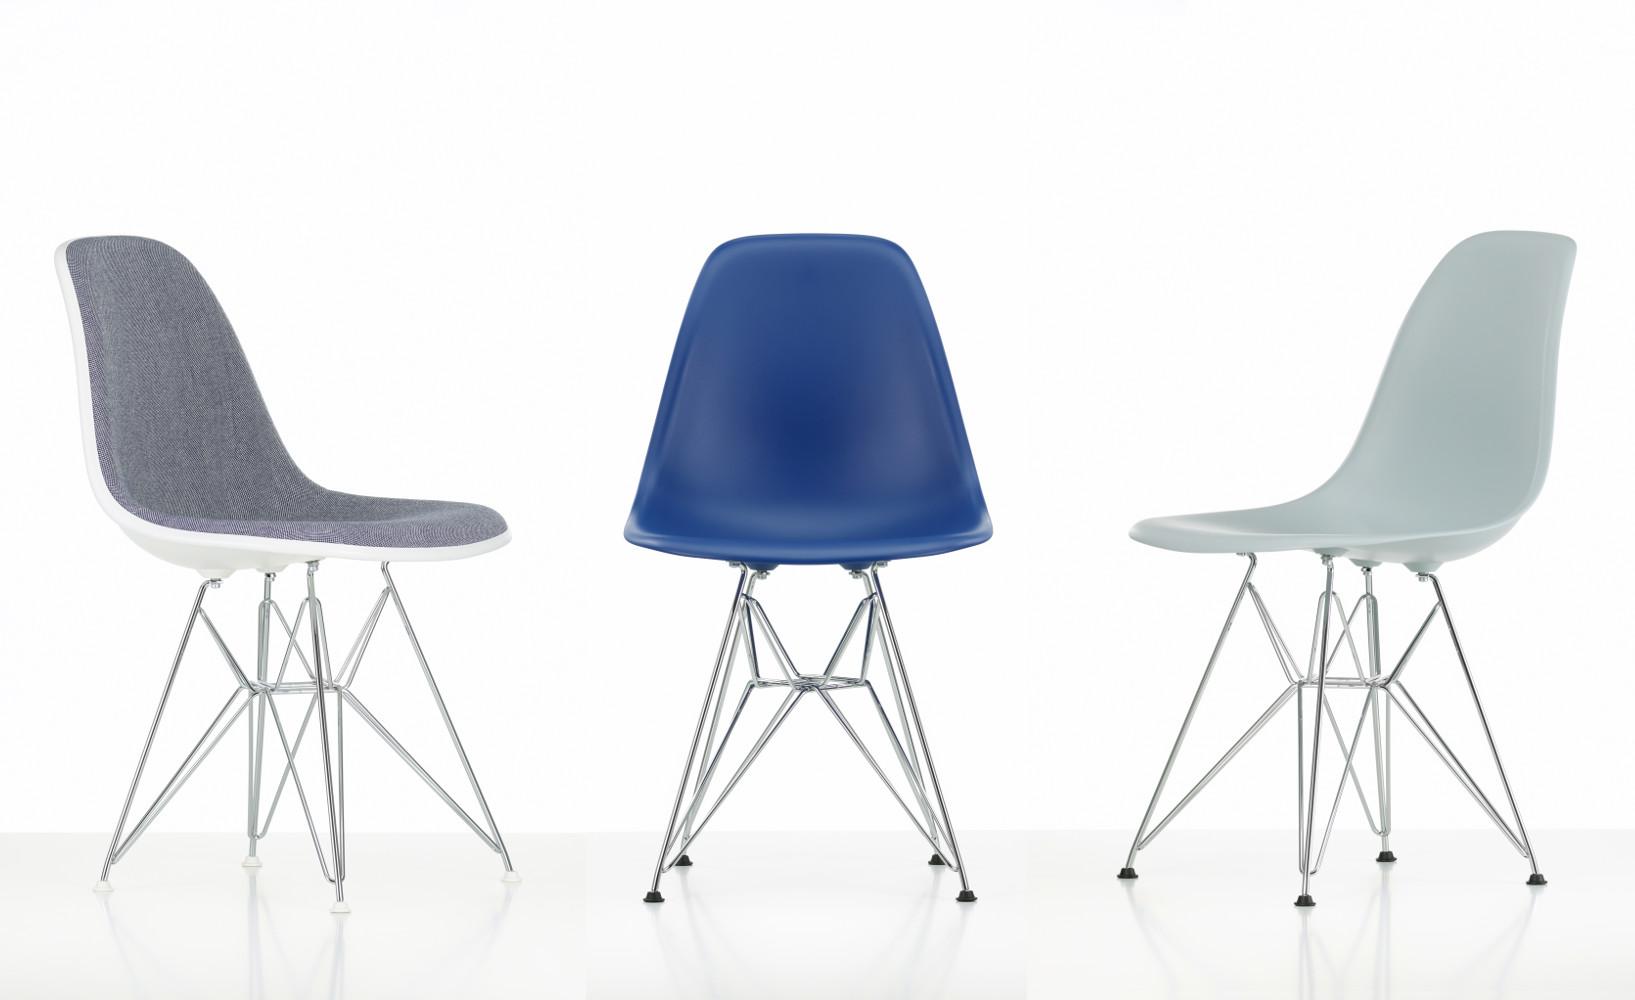 vitra stuhl eames plastic chair. Black Bedroom Furniture Sets. Home Design Ideas